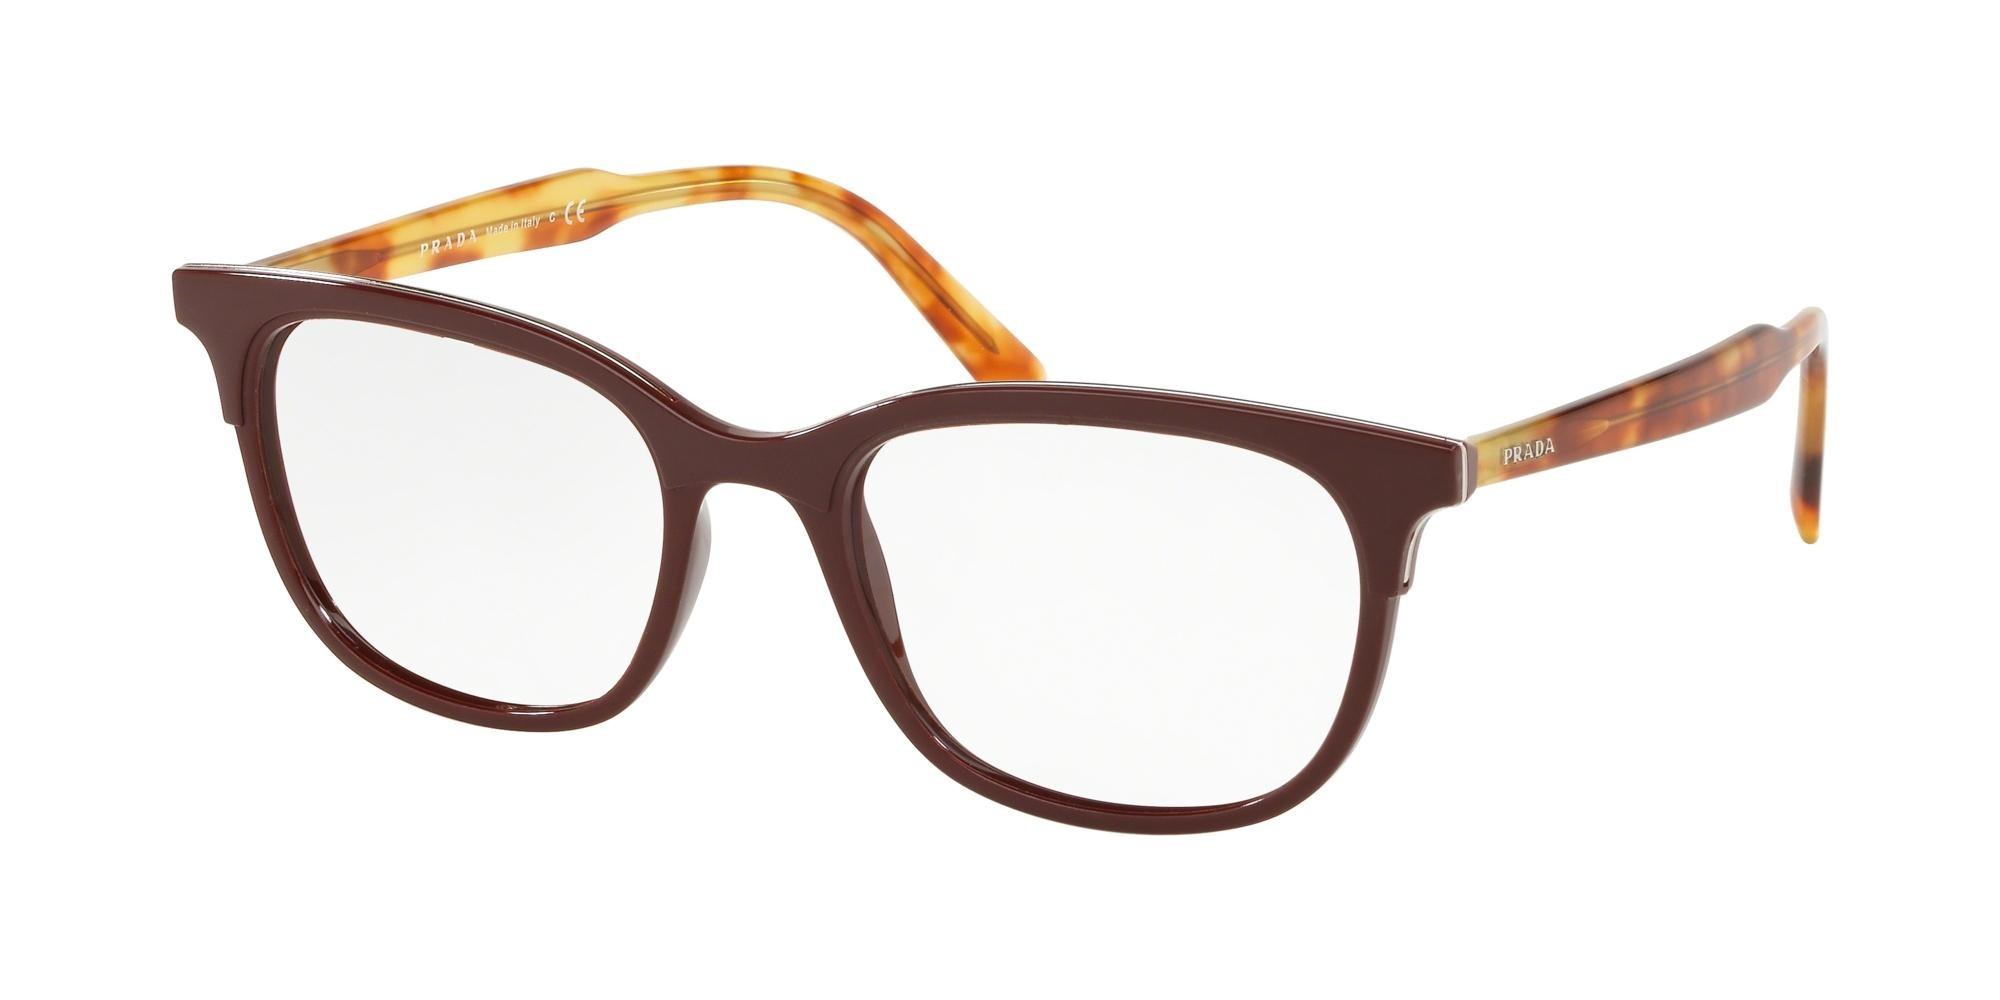 Prada eyeglasses PRADA LETTERING LOGO PR 05VV